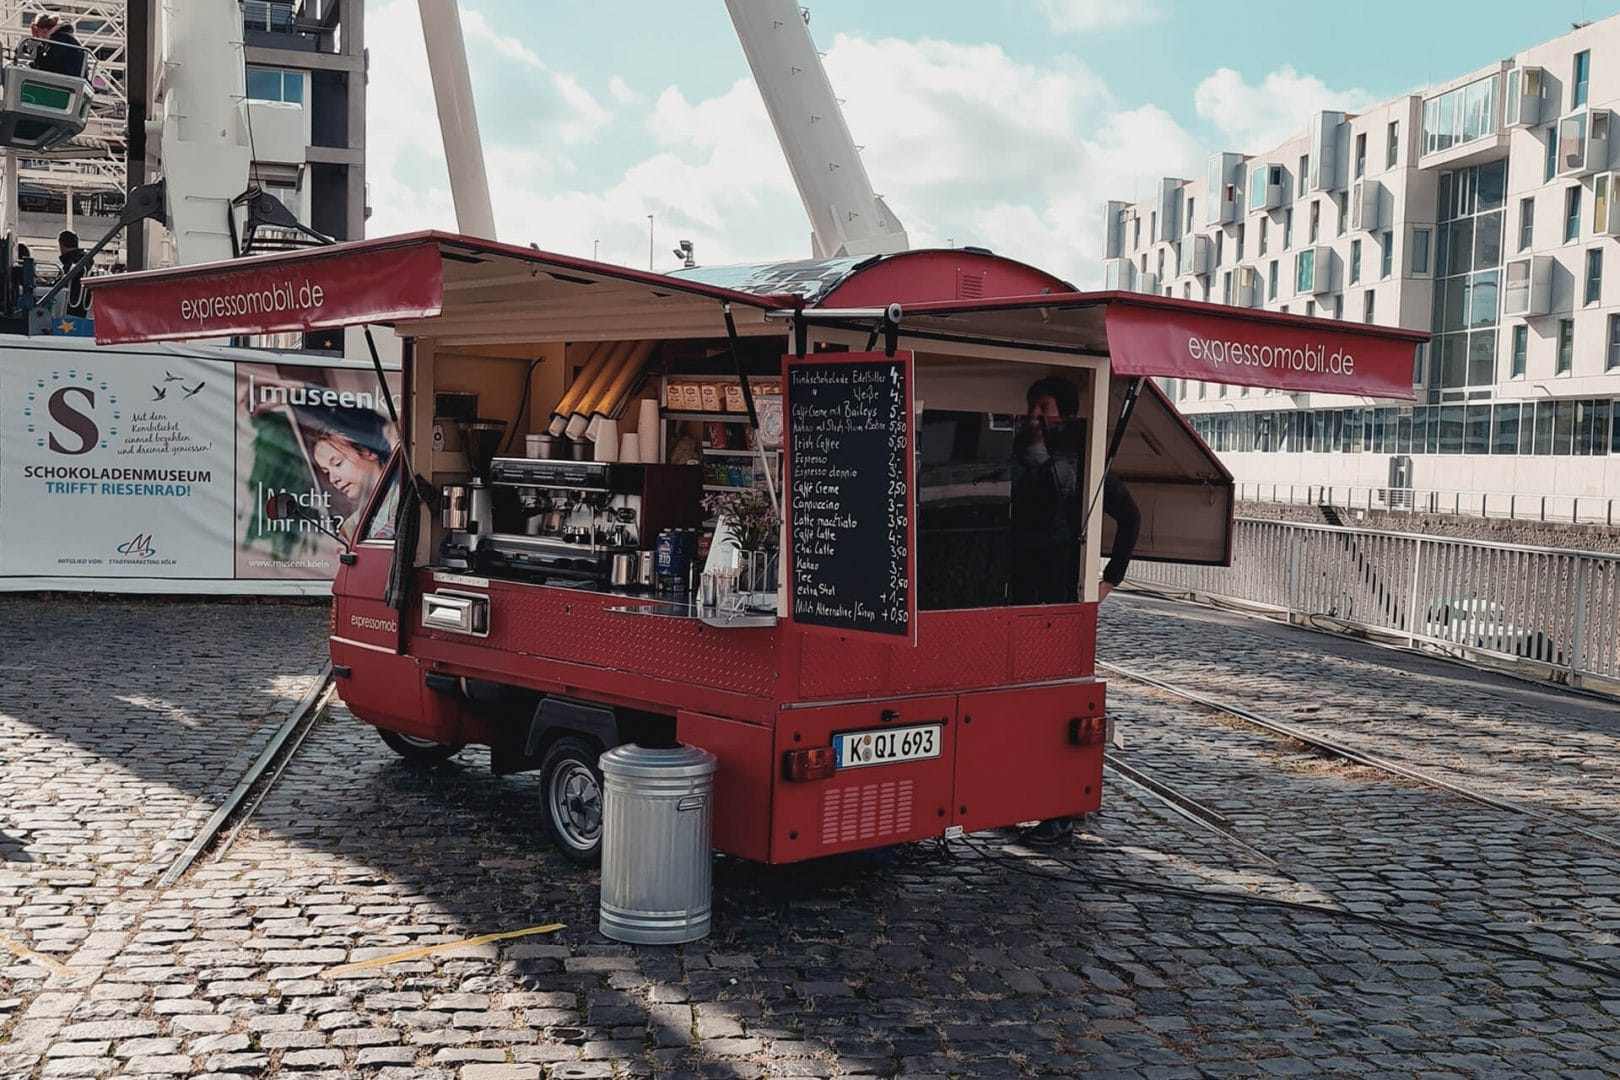 Espressomobil im Rheinauhafen